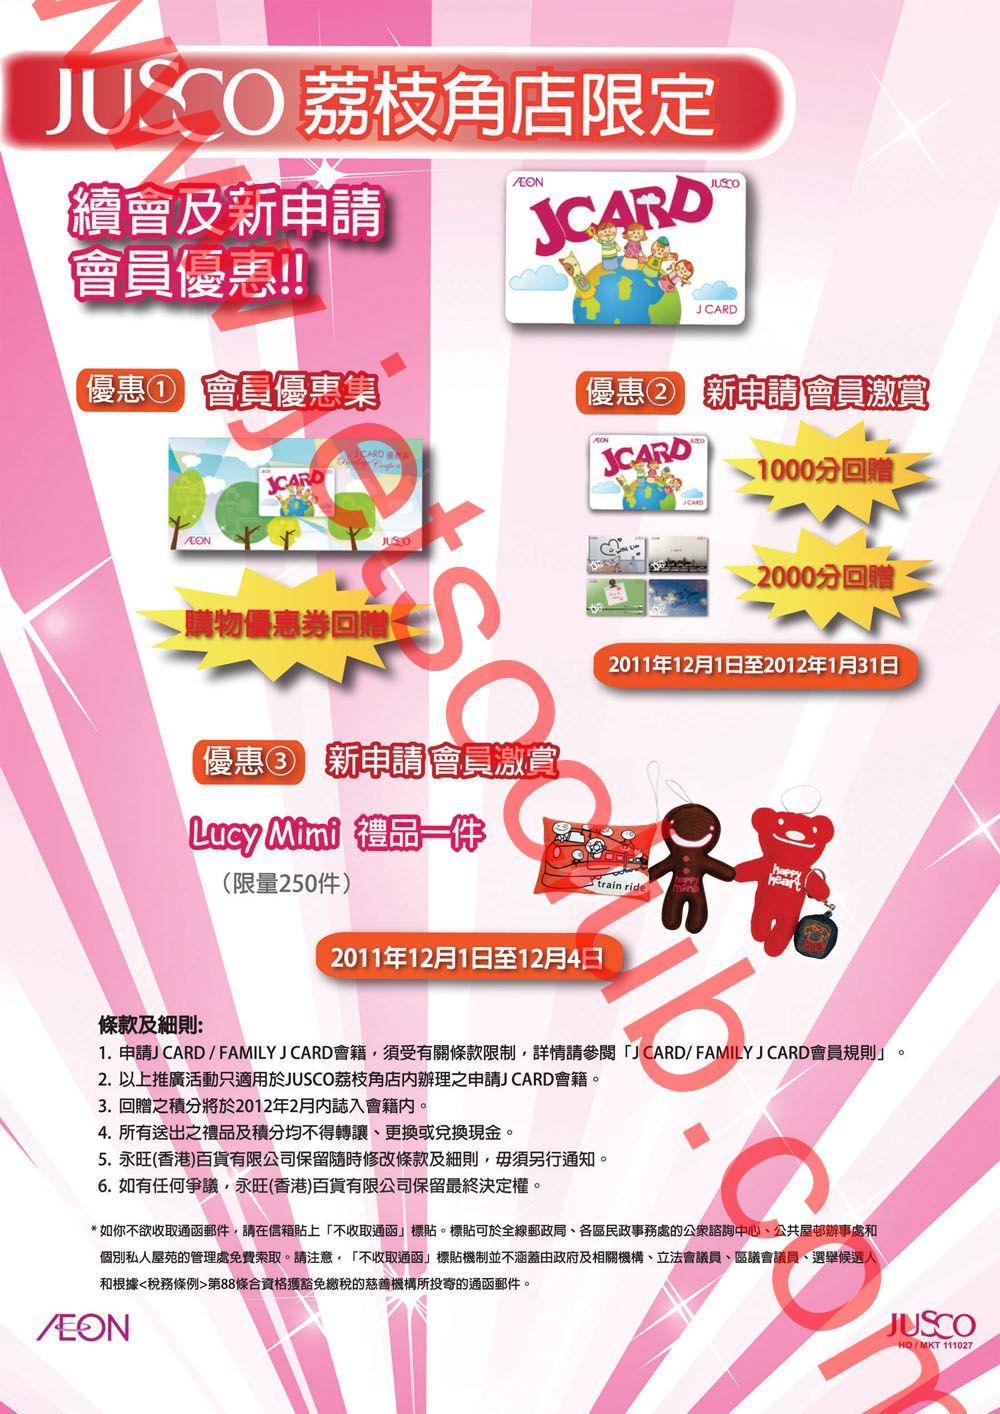 JUSCO荔枝角店: 吃‧喝‧玩‧樂新熱點(至16/12) ( Jetso Club 著數俱樂部 )